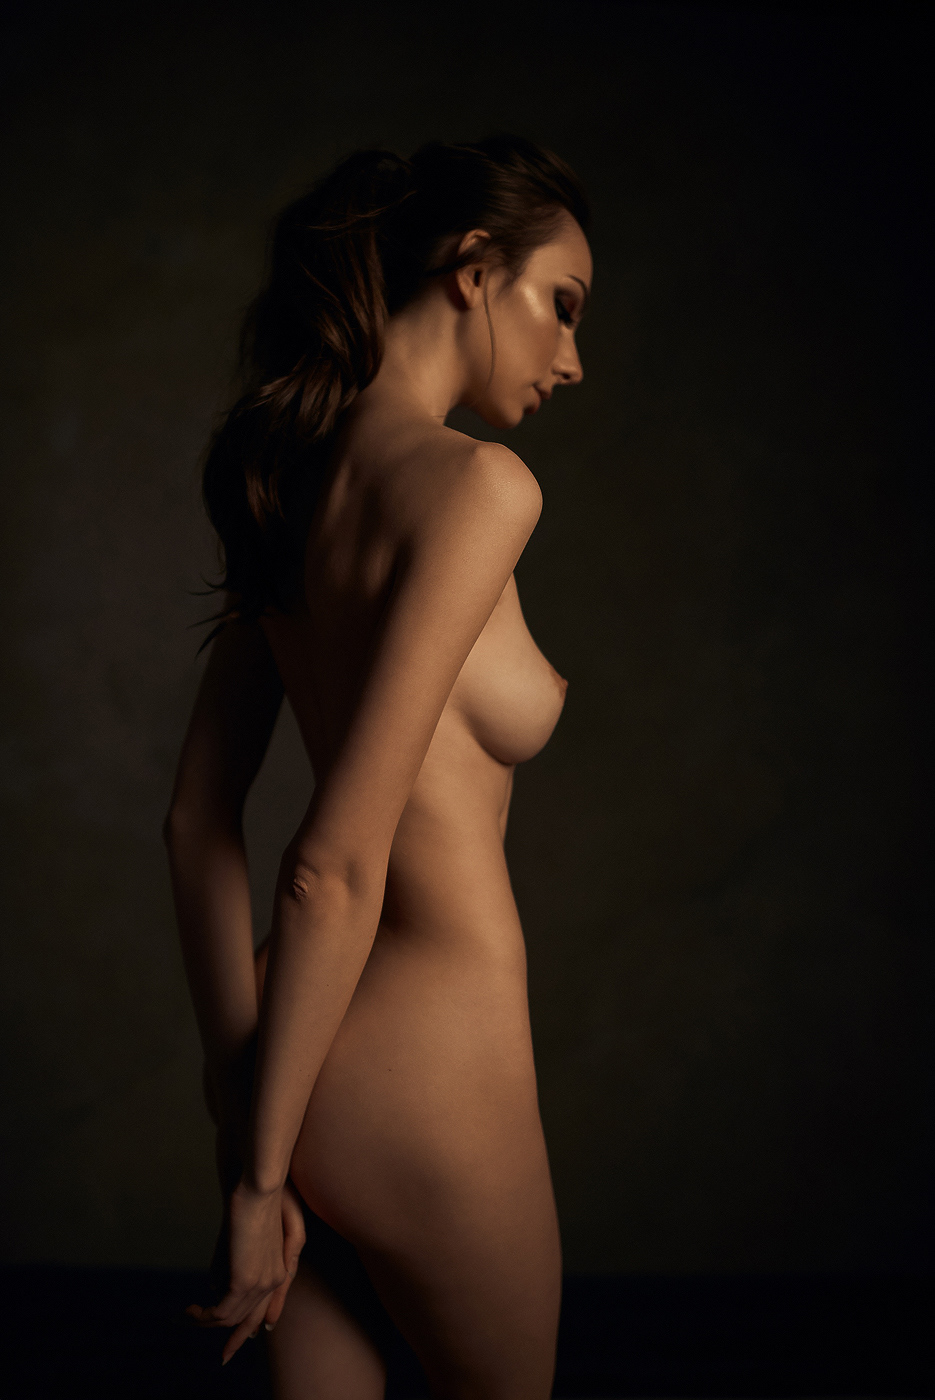 Margo Amp / фотограф Дмитрий Бугаенко